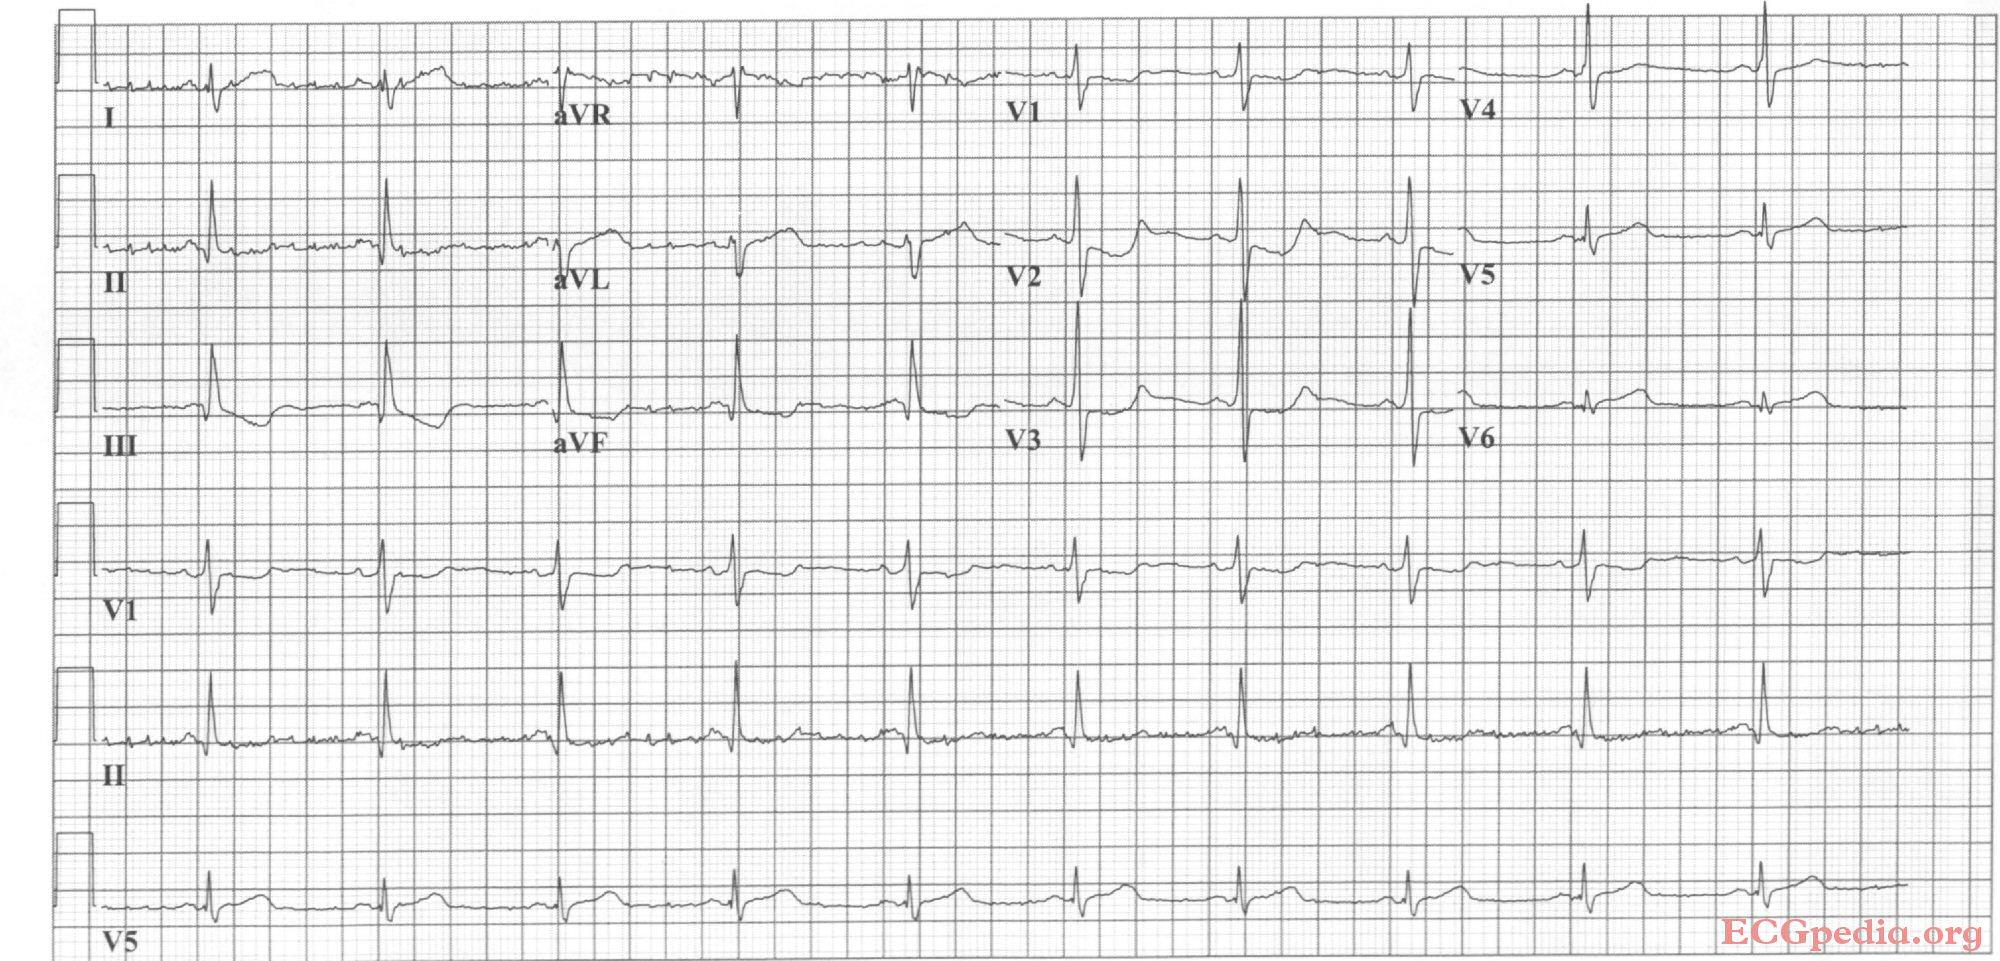 Posterior Myocardial Infarction